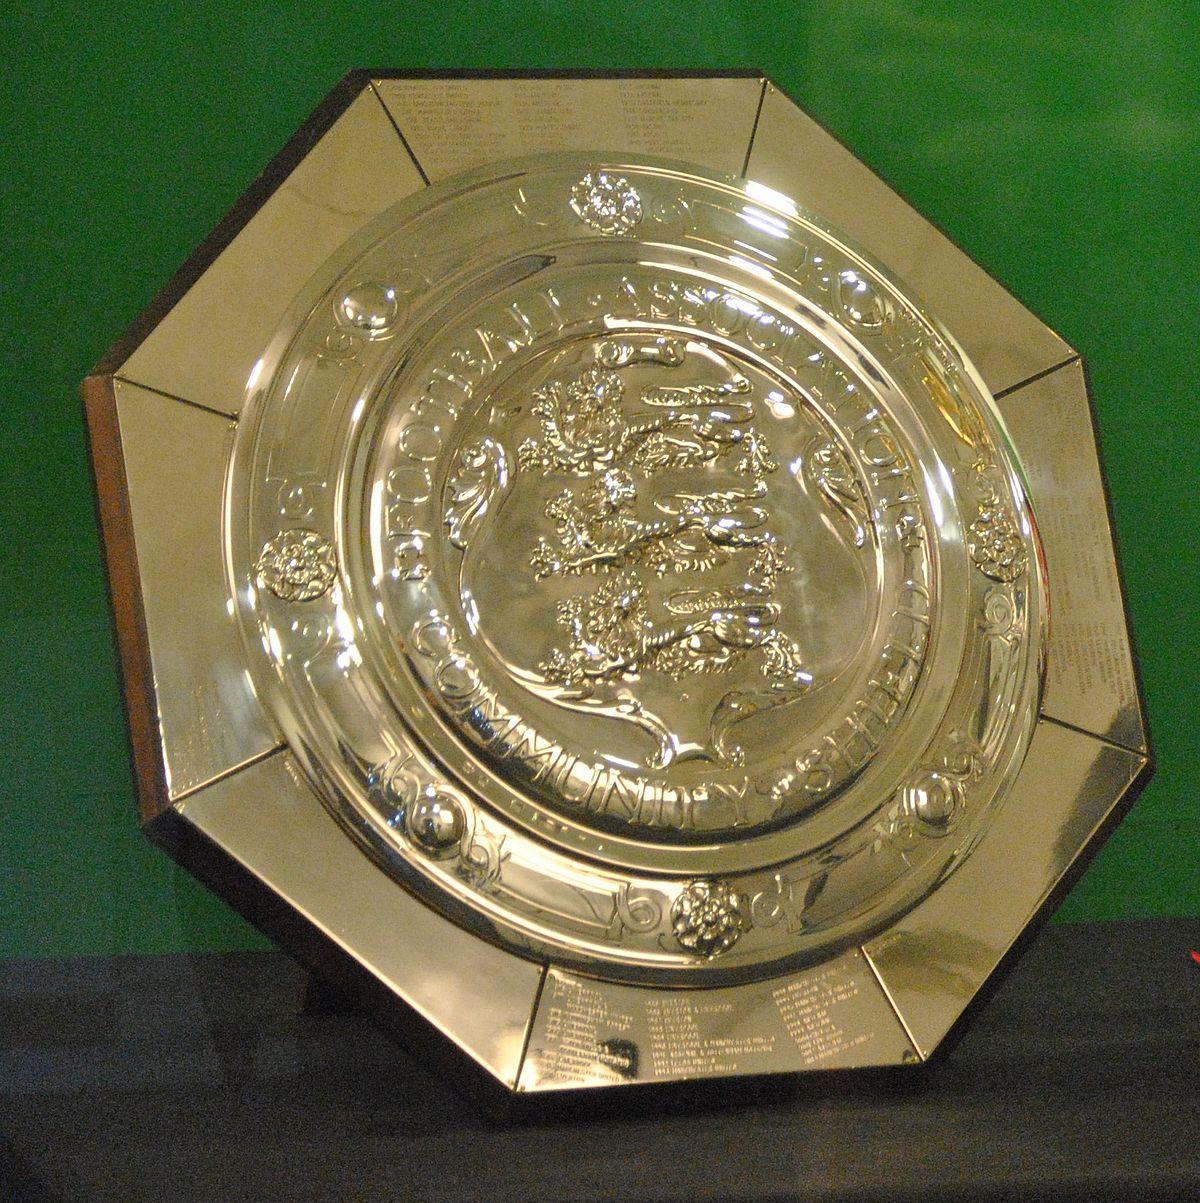 Supercup: List Of FA Community Shield Matches